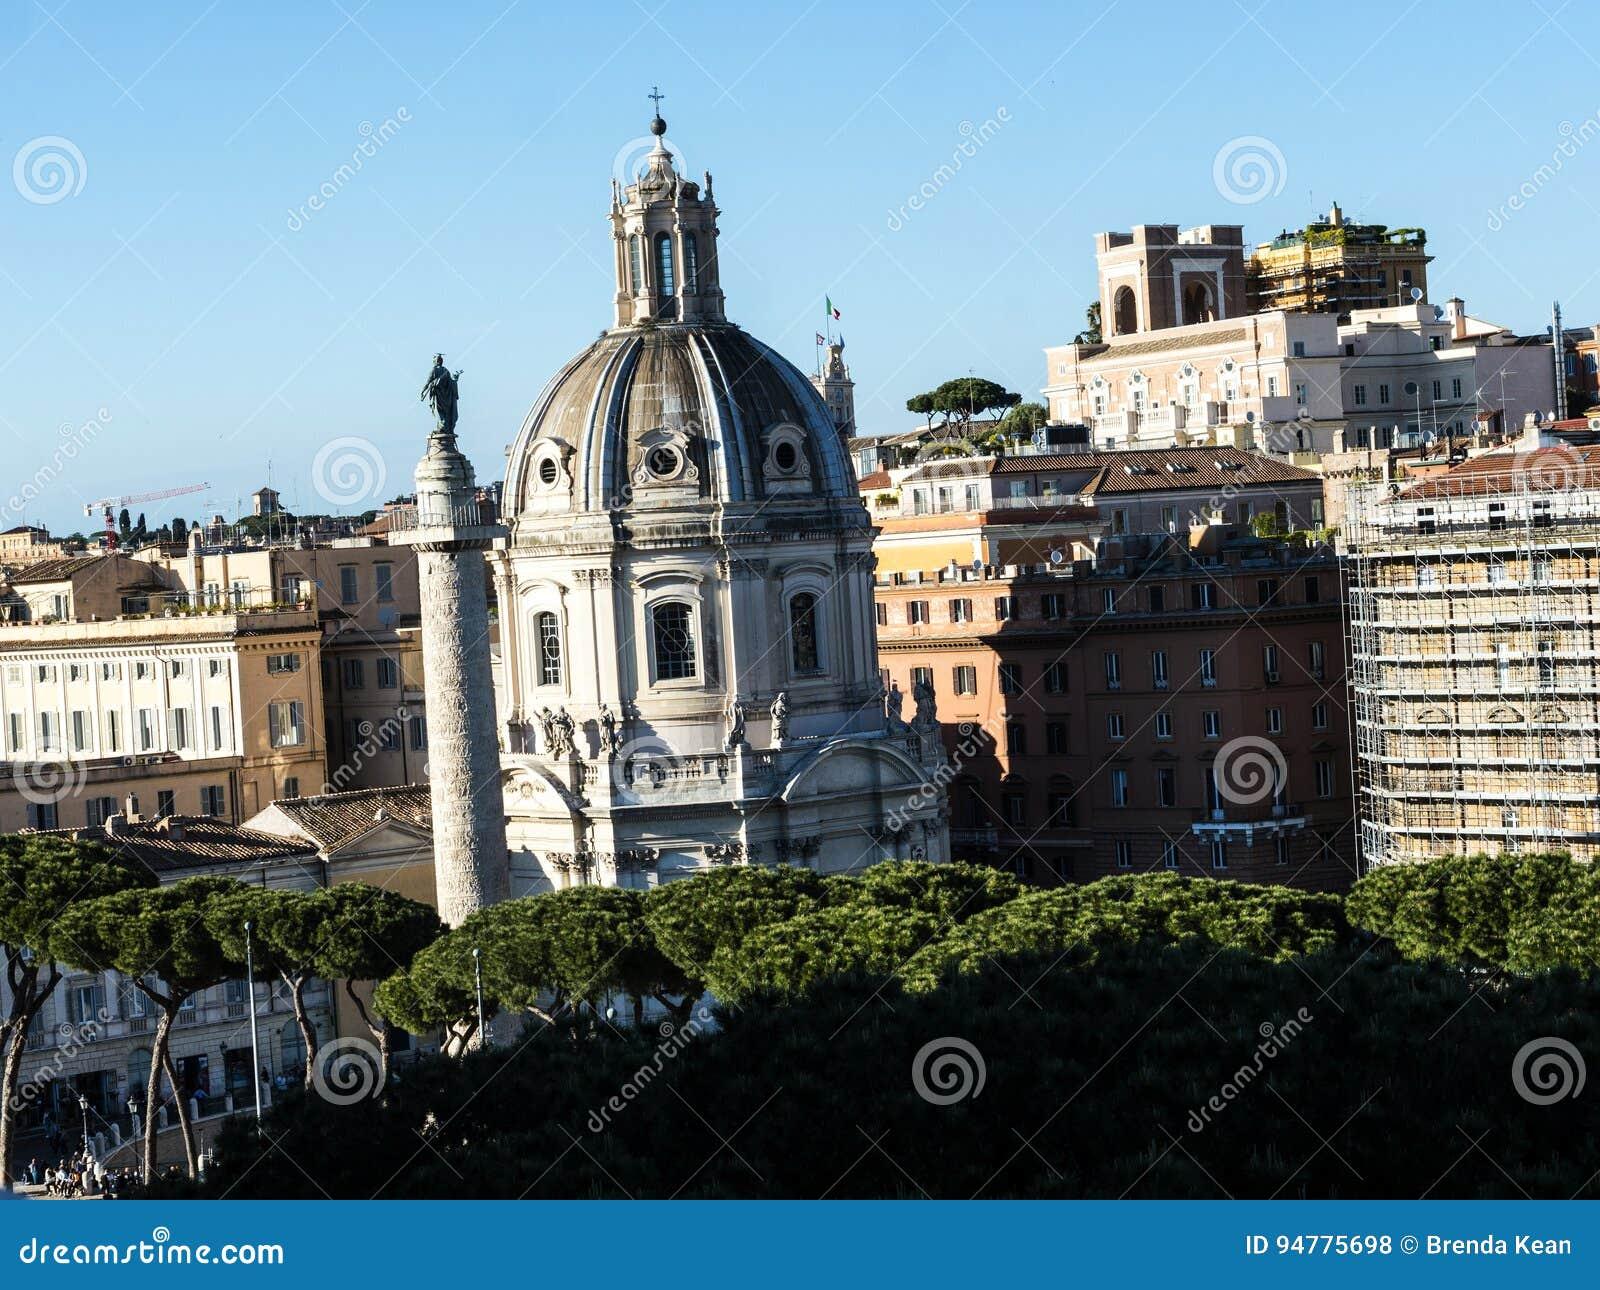 Vue Du Monument Au Roi Vittorio Emanuele 2 Dans Piazza